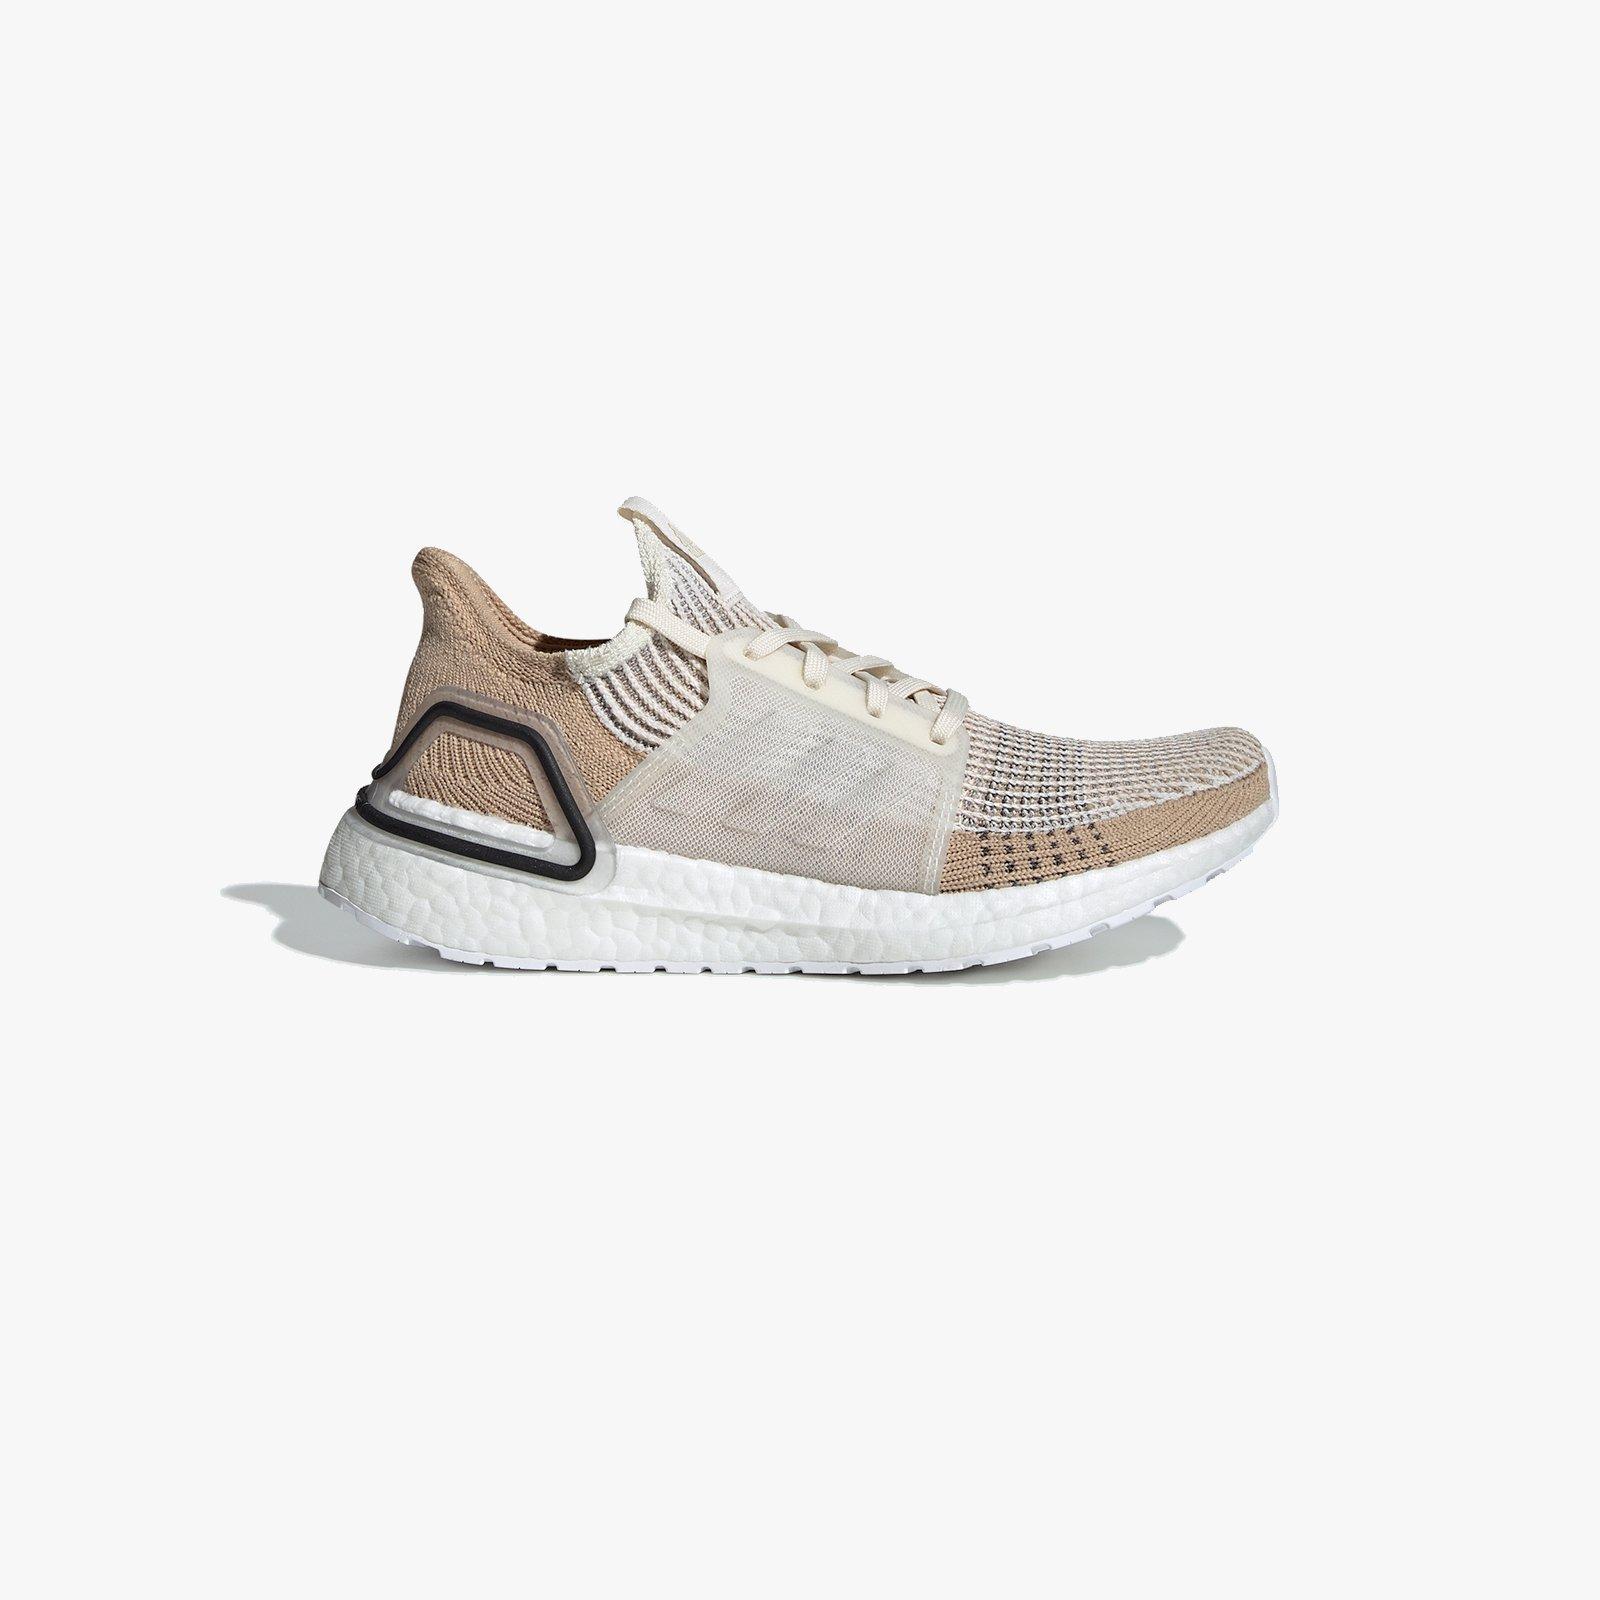 2b0d66a3d58e56 adidas Ultraboost 19 W - B75878 - Sneakersnstuff